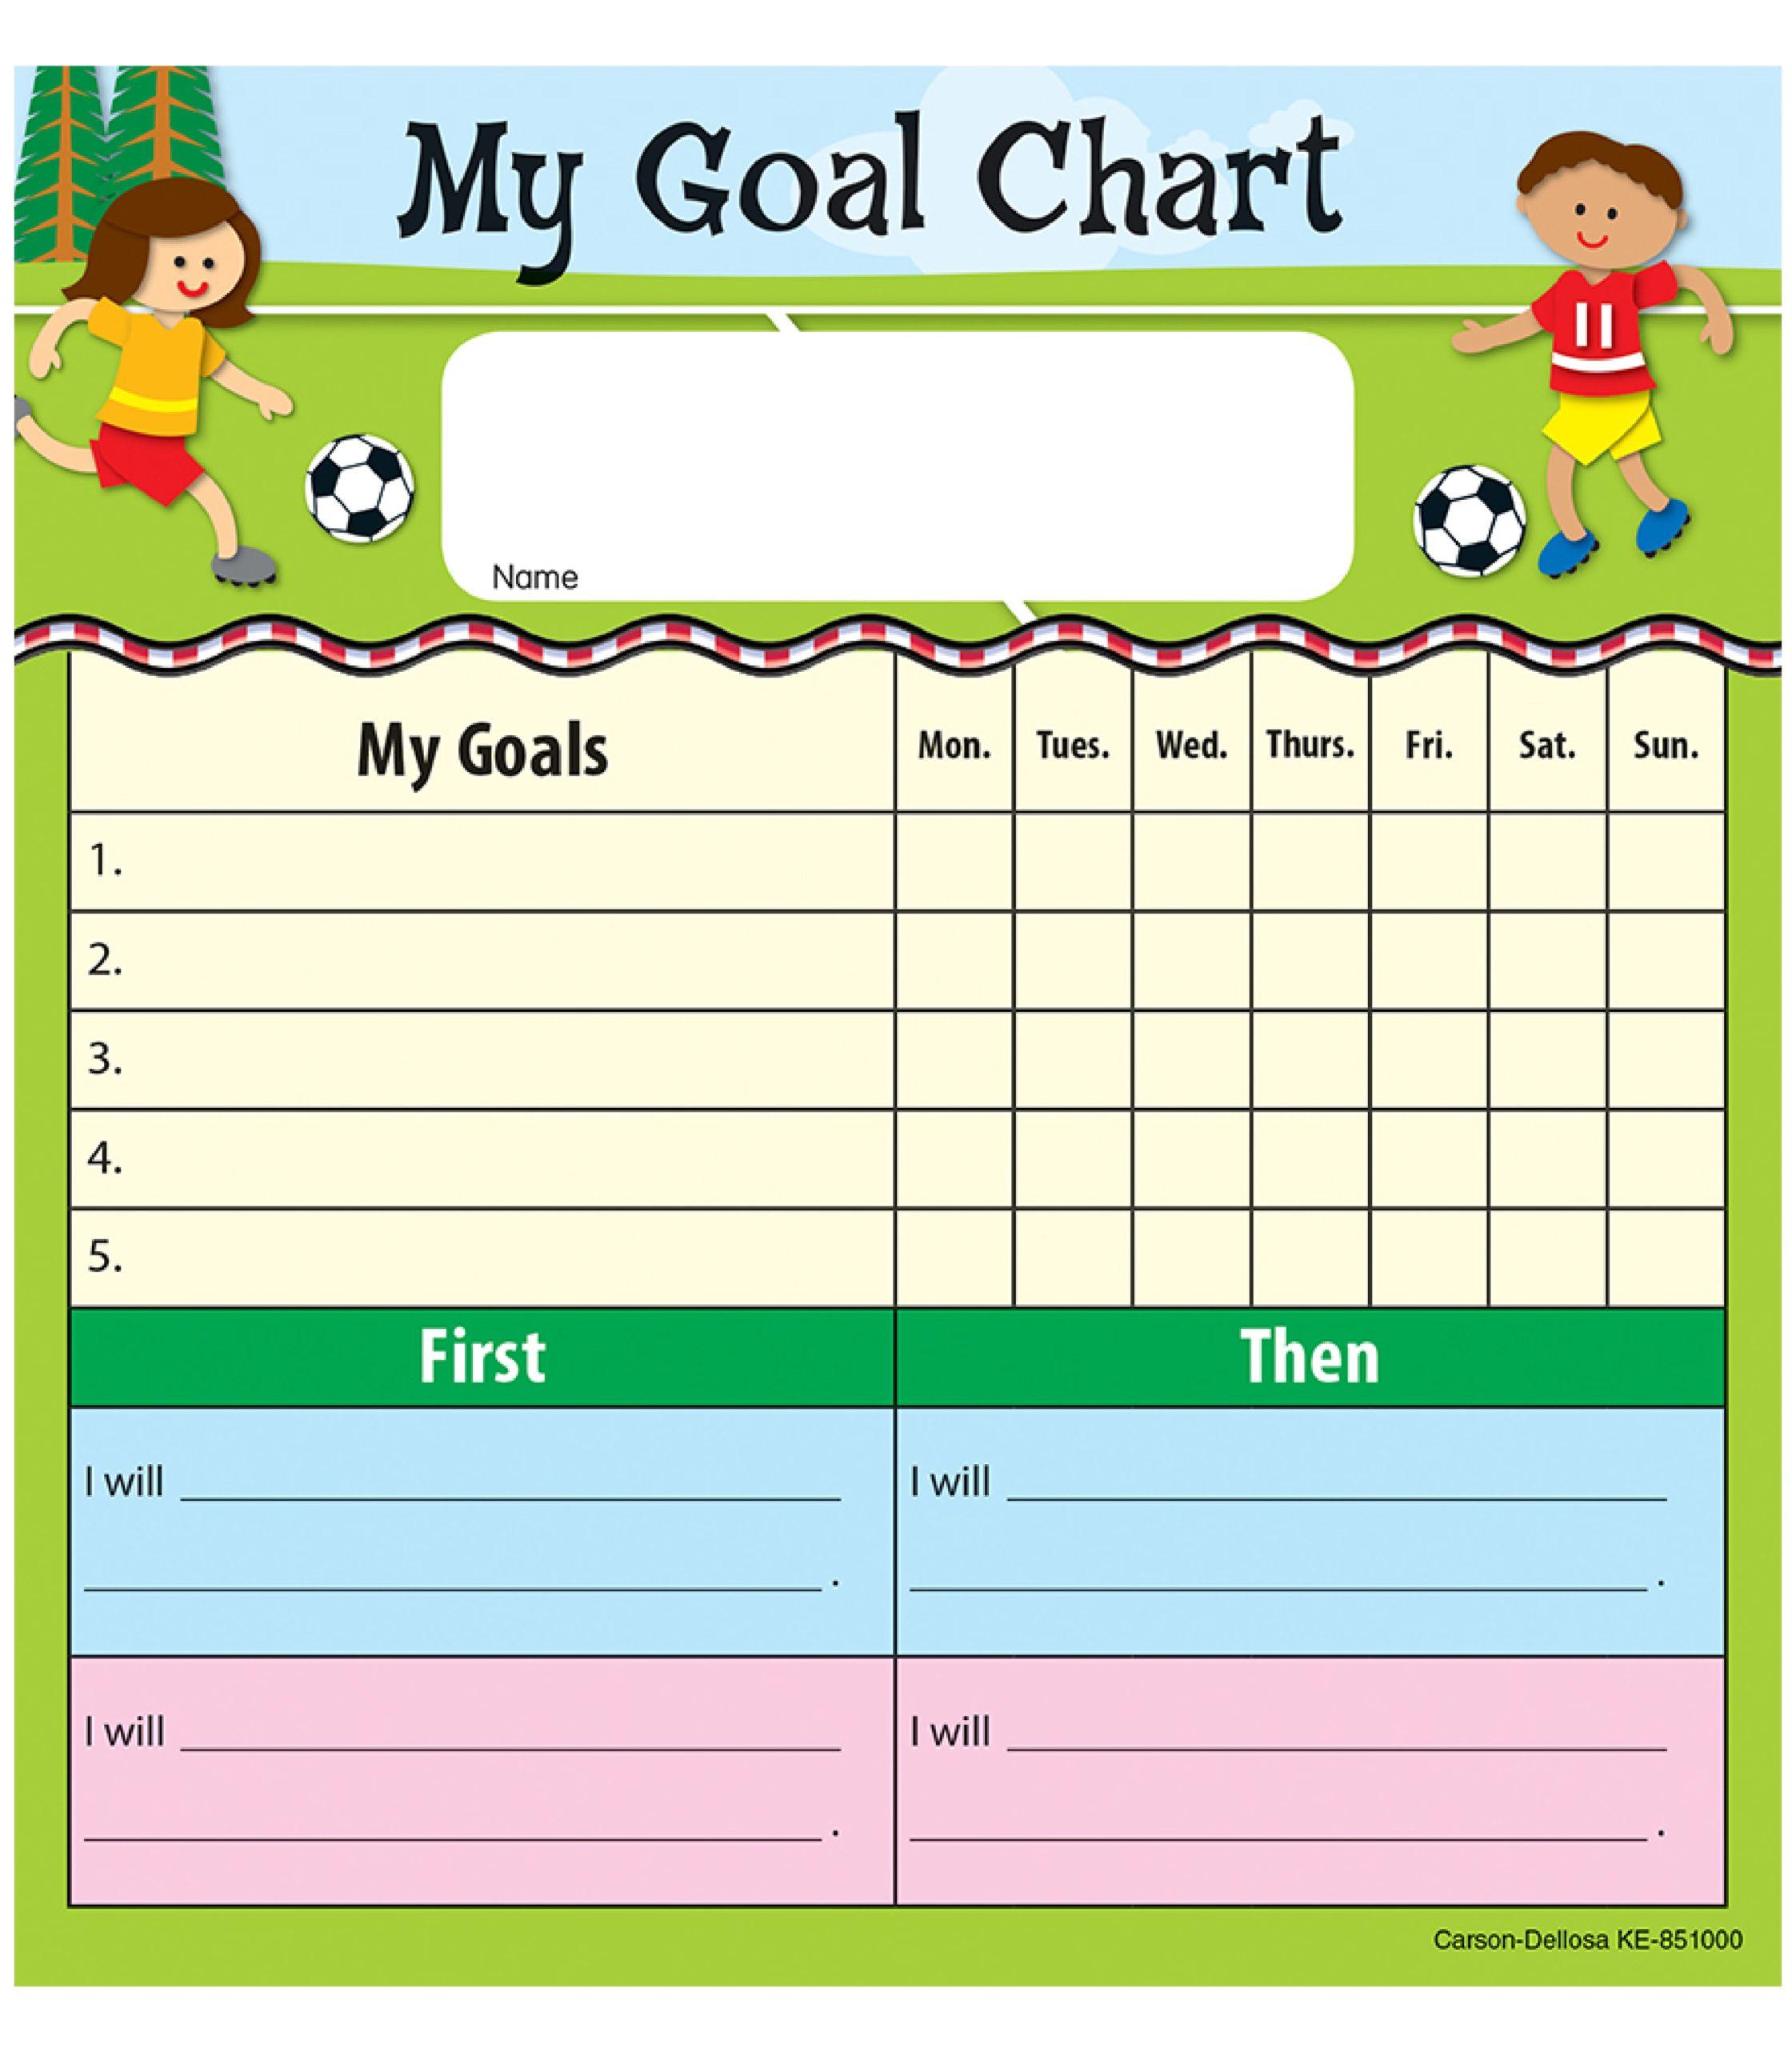 Free goal chart template 13